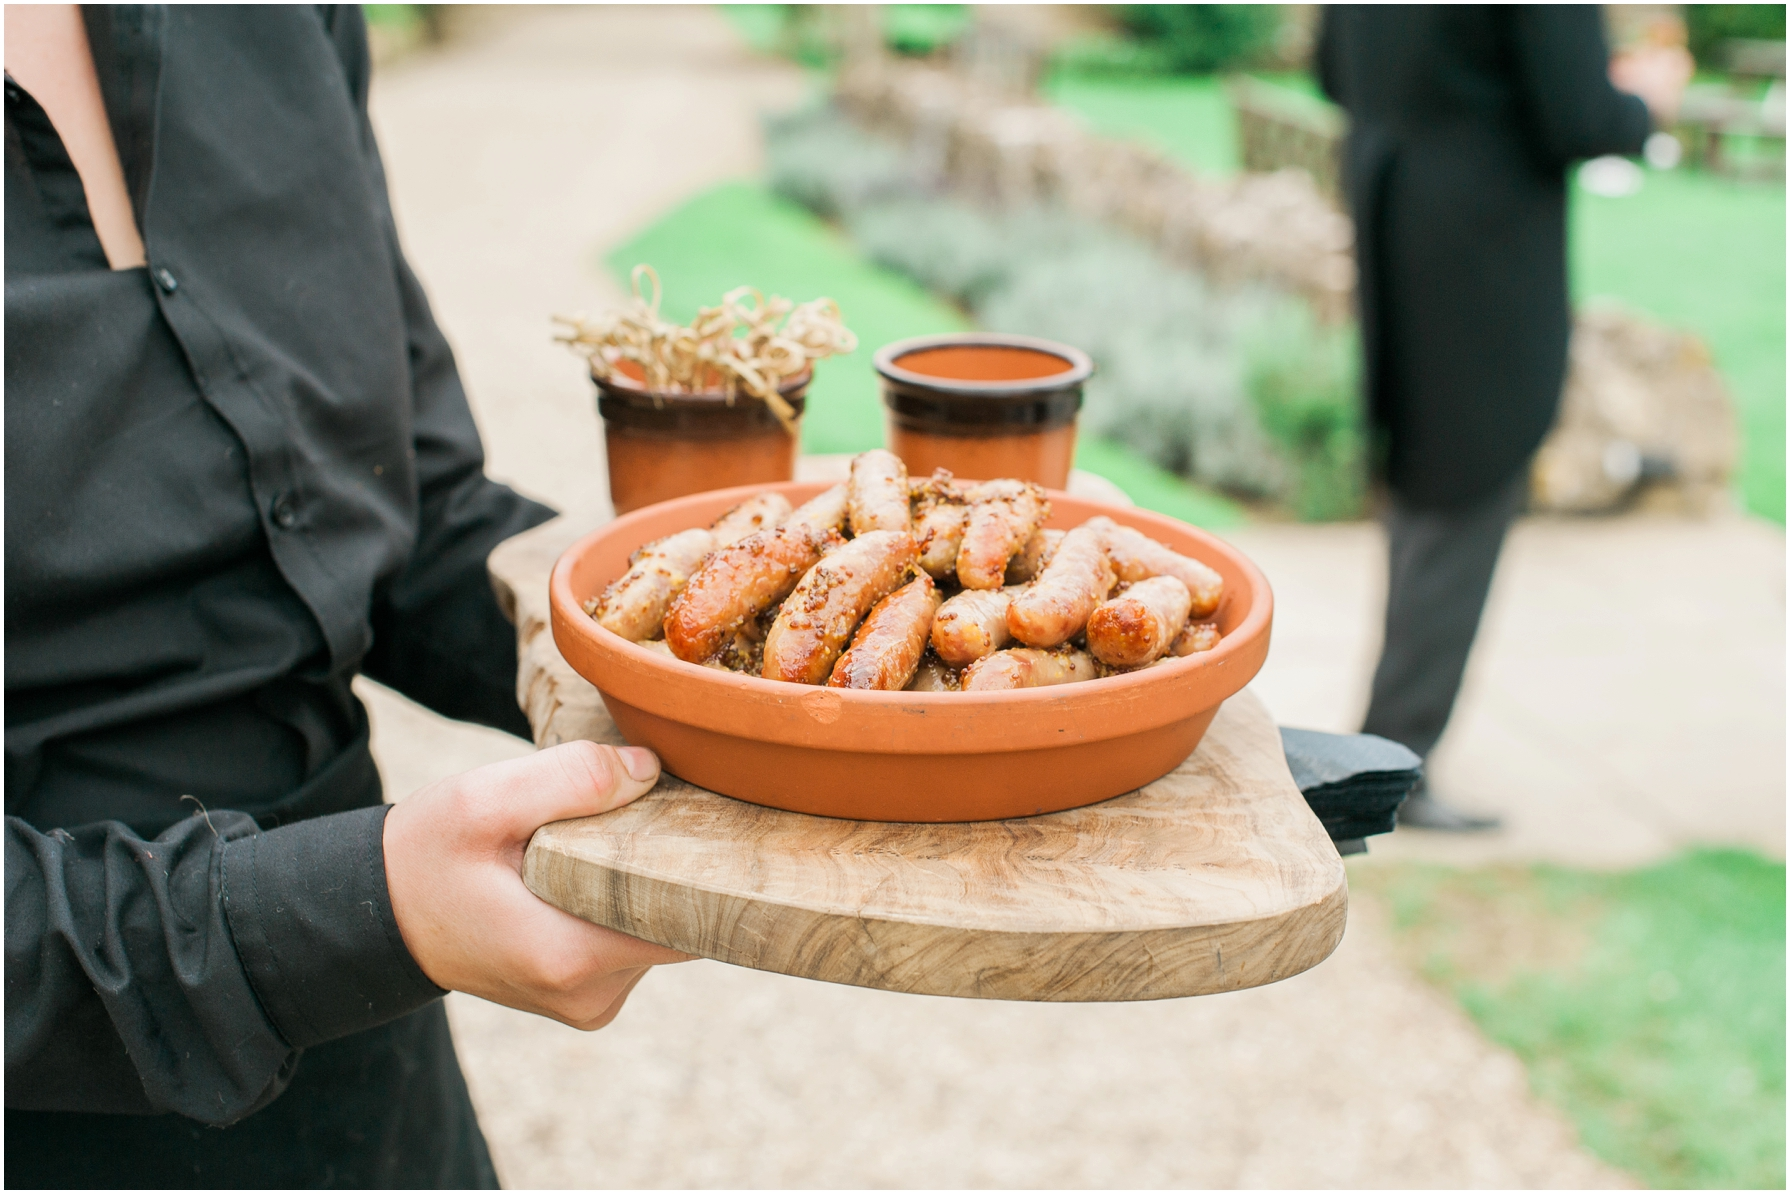 sausage canapes and mustard dip